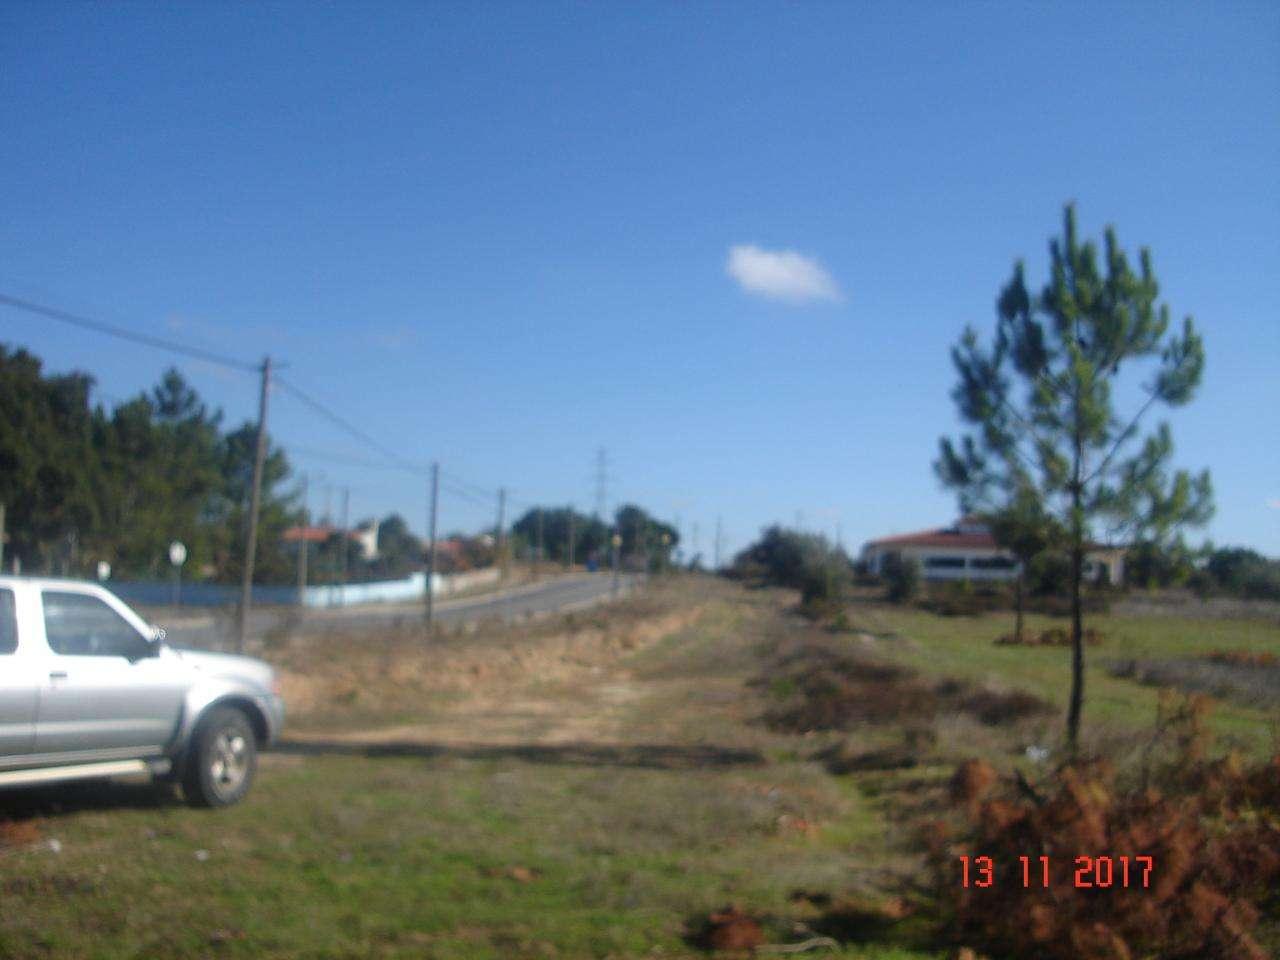 Terreno para comprar, Quinta do Anjo, Palmela, Setúbal - Foto 6